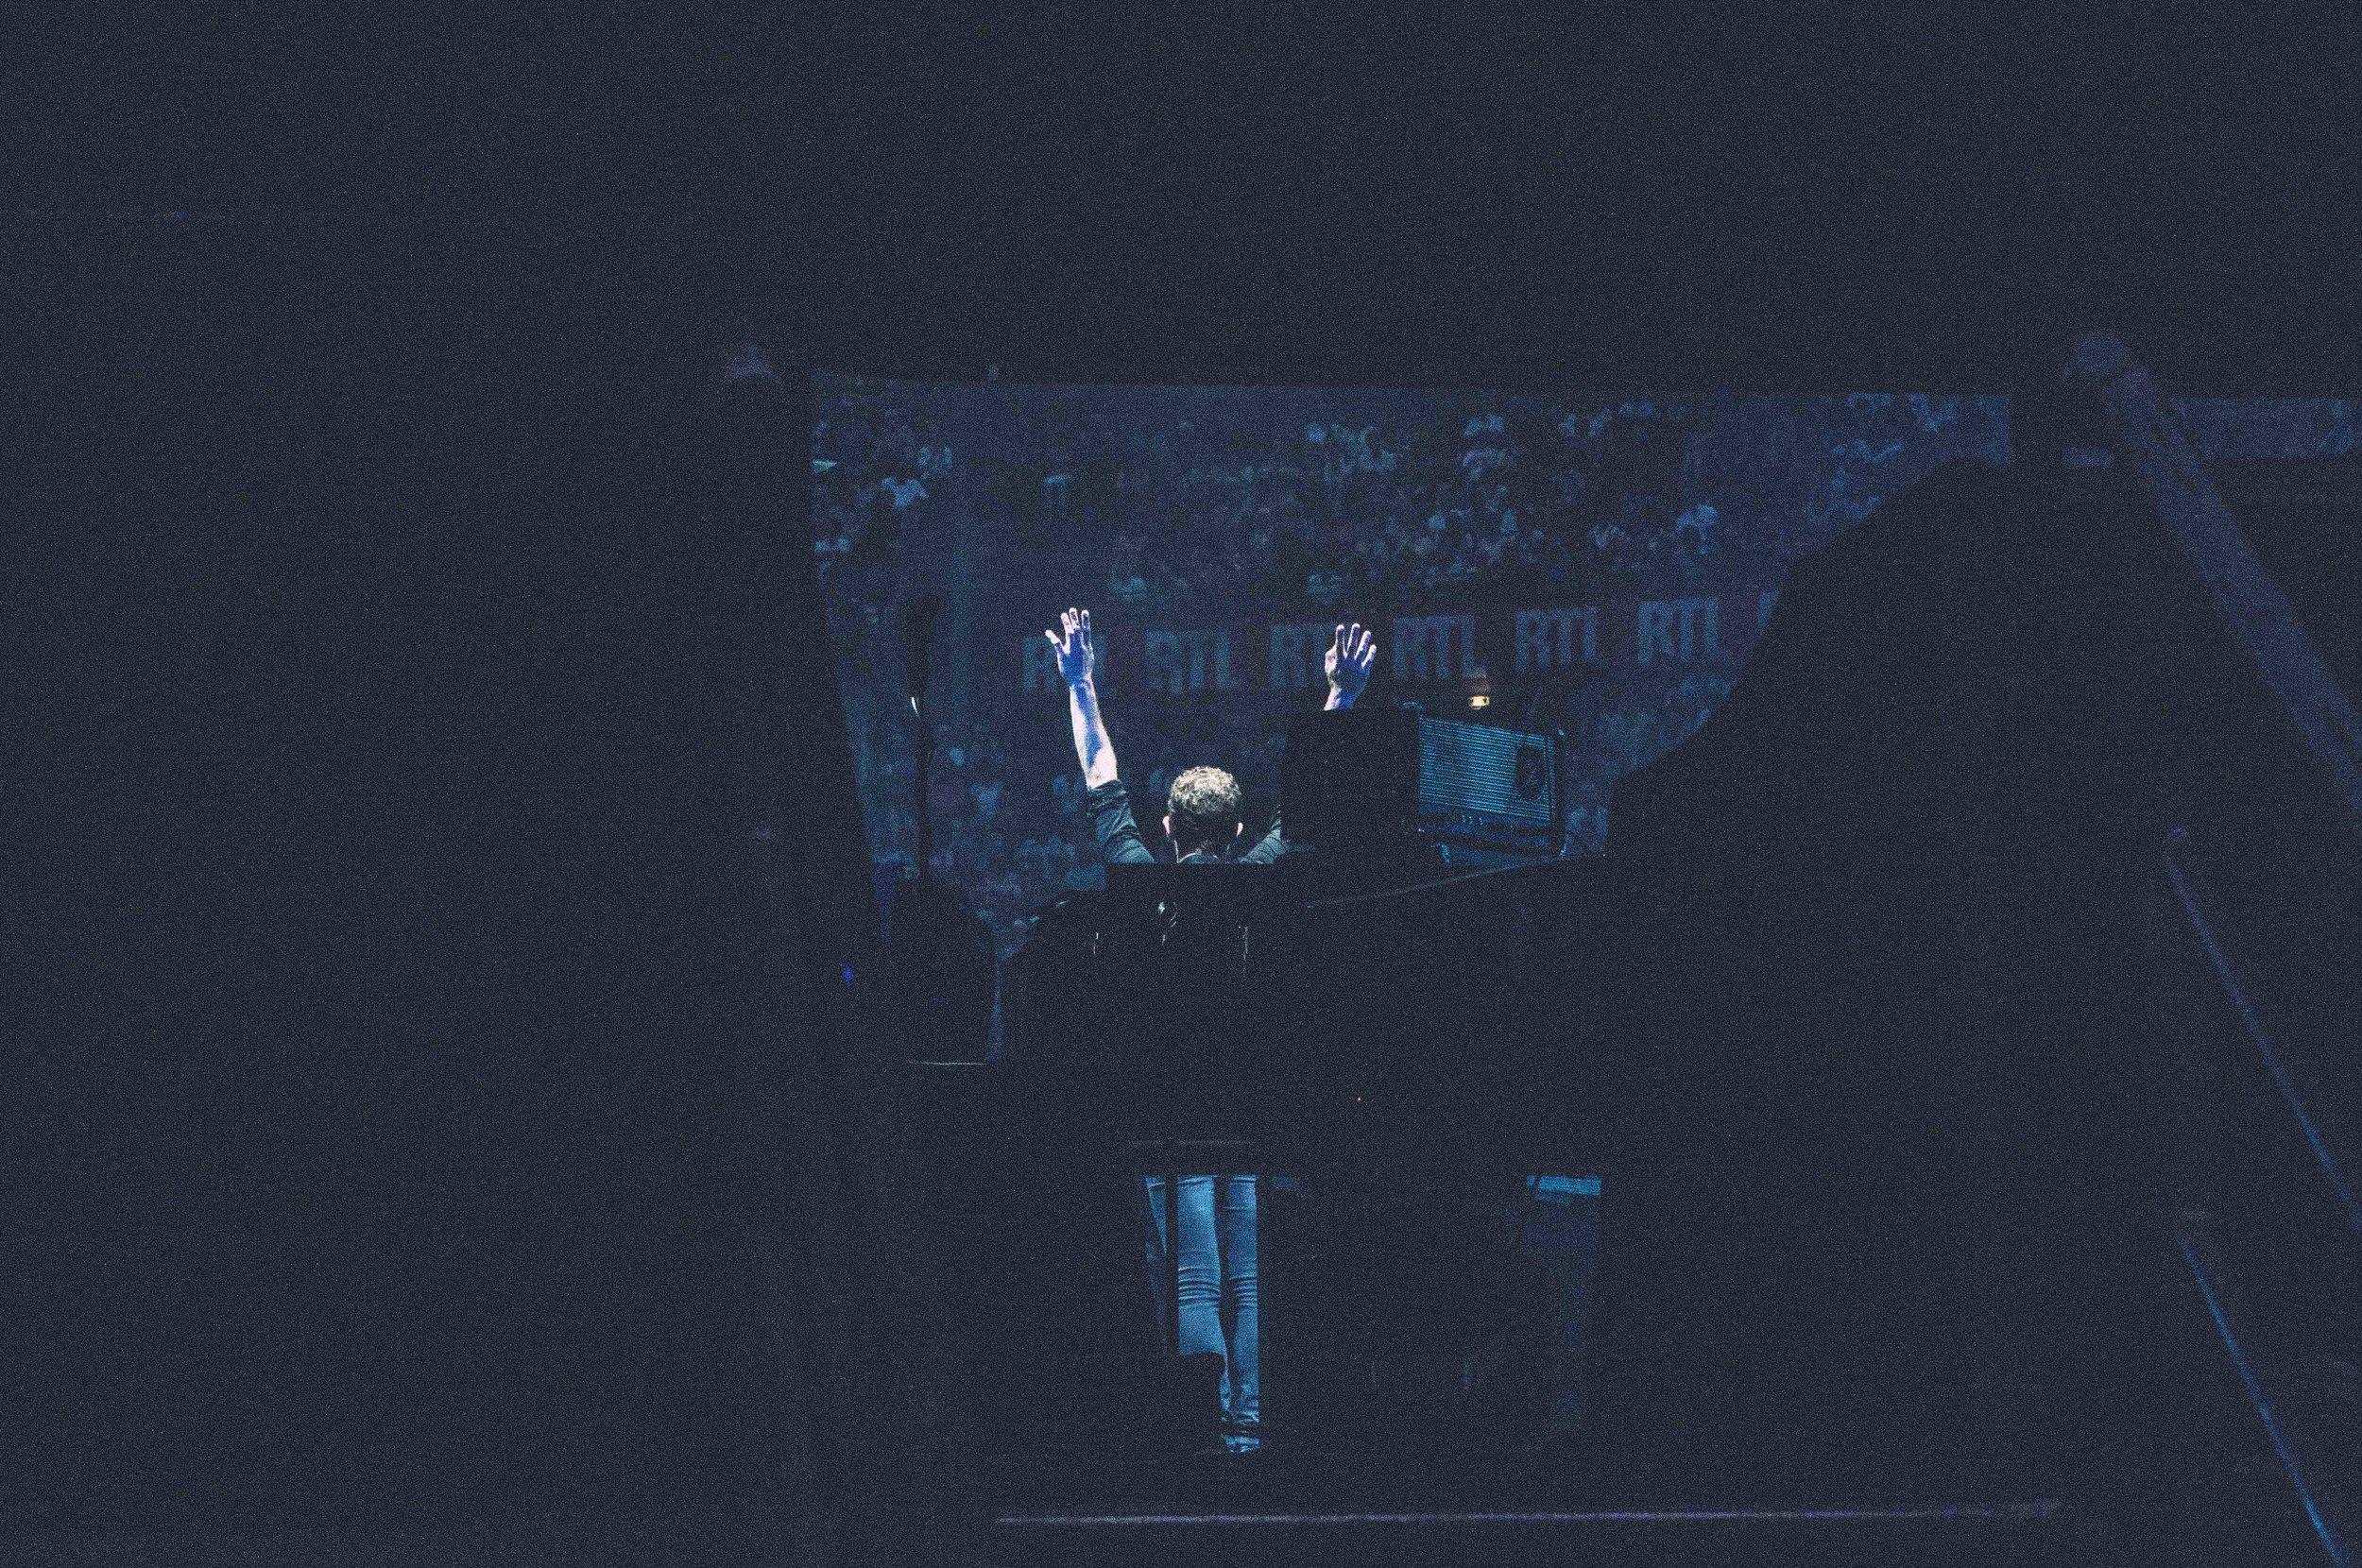 20160723-MarvinJouno-Live-Nimes-PremierJet-96.jpg